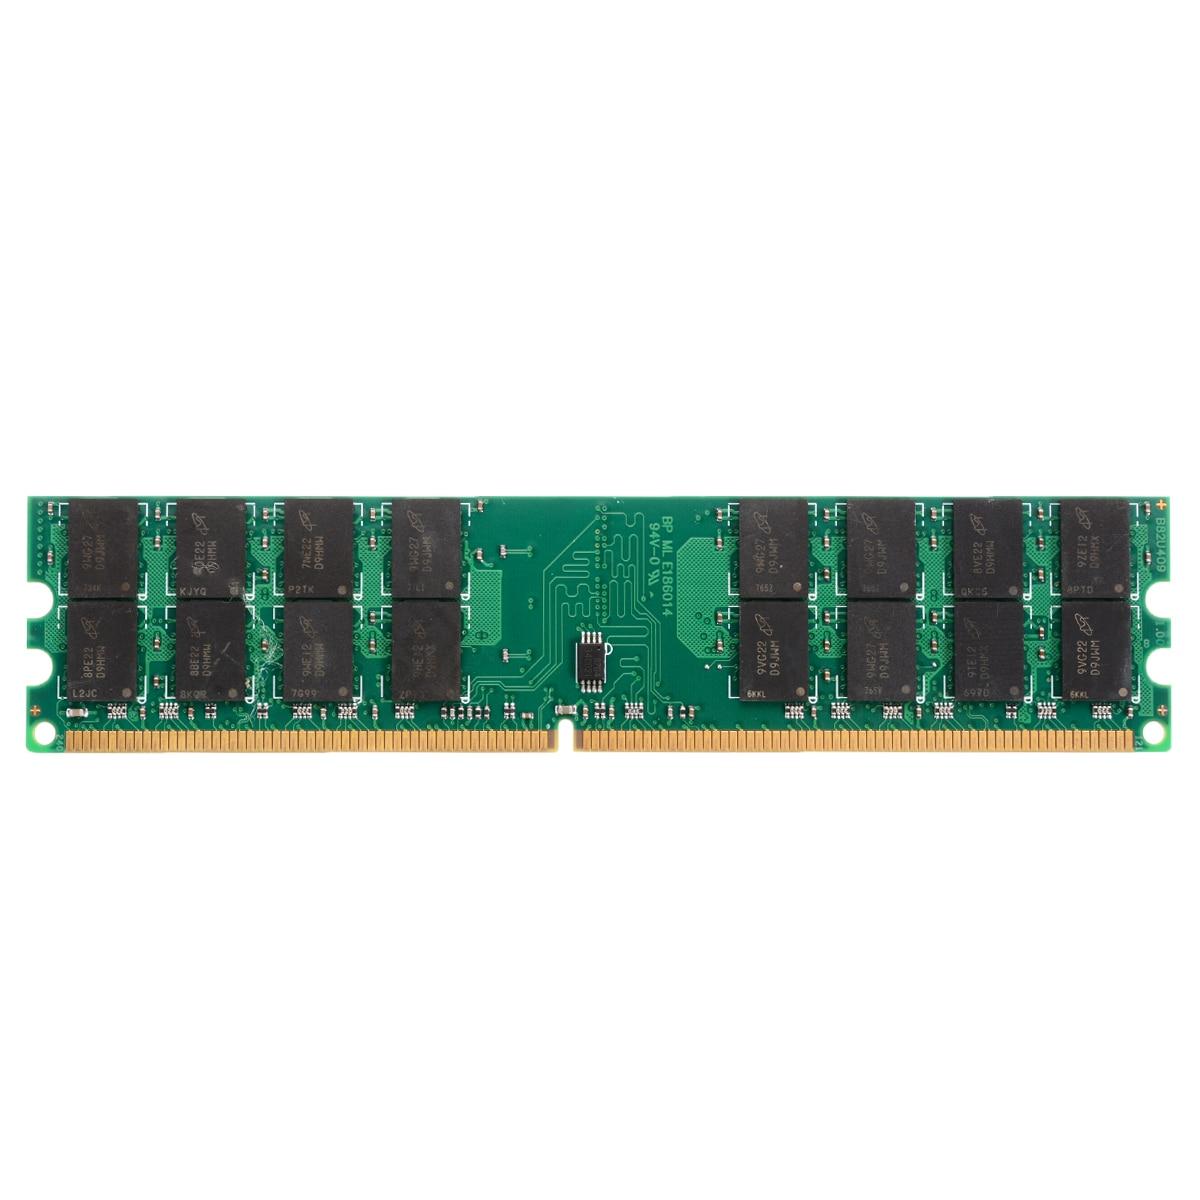 Barra de memoria RAM de escritorio de 4GB DIMM DDR2 677MHZ 240Pin 4GB, módulo de memoria de ordenador PC de escritorio para placa base AMD